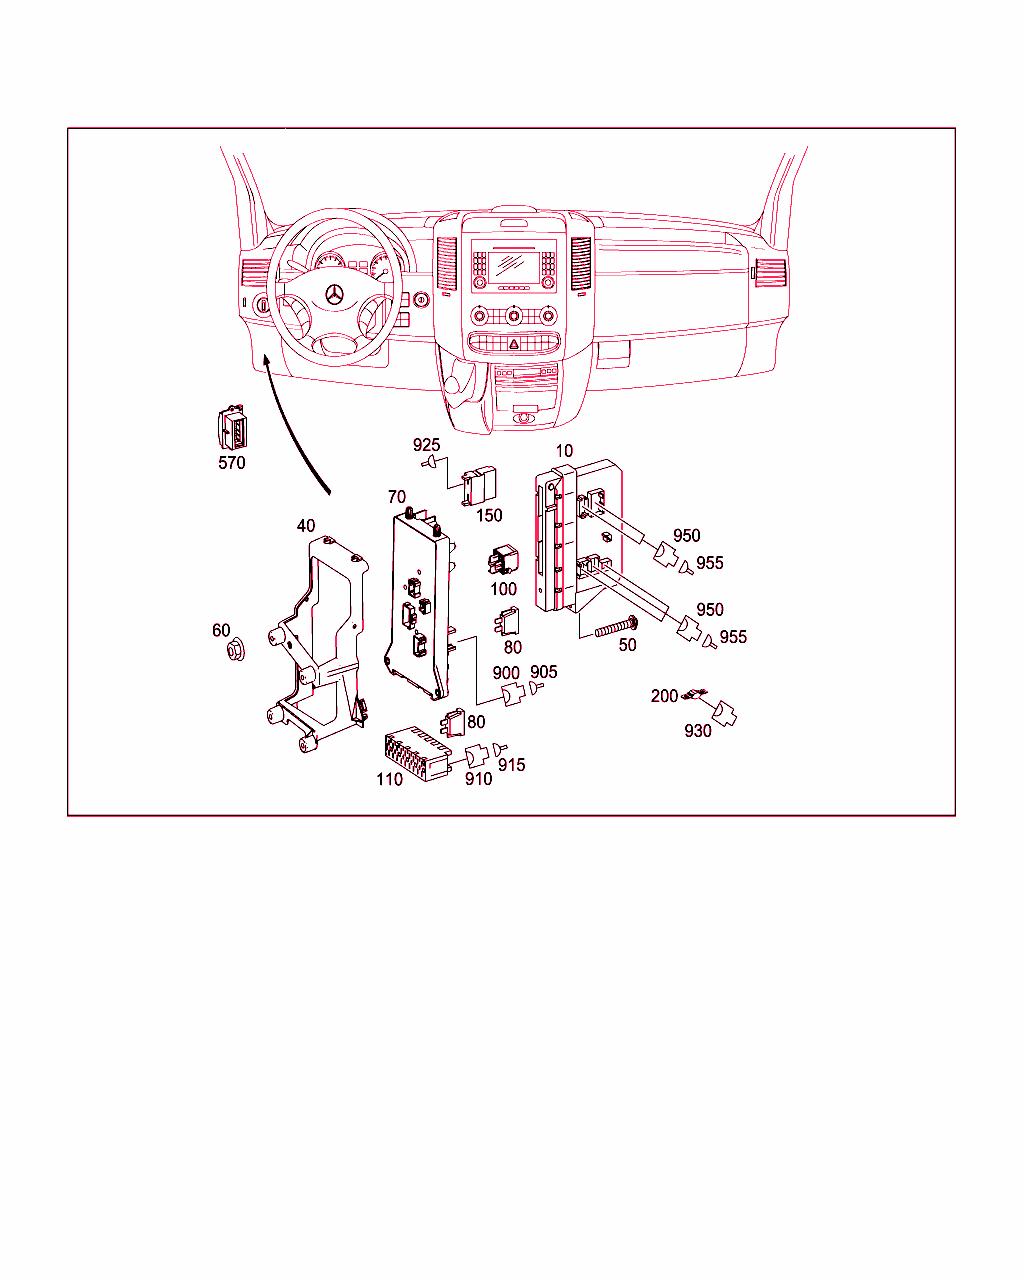 Swell Mercedes Benz Epc 224 906 613 Panel Van Wheelbase 3665 Mm 3 0 Wiring Cloud Licukaidewilluminateatxorg